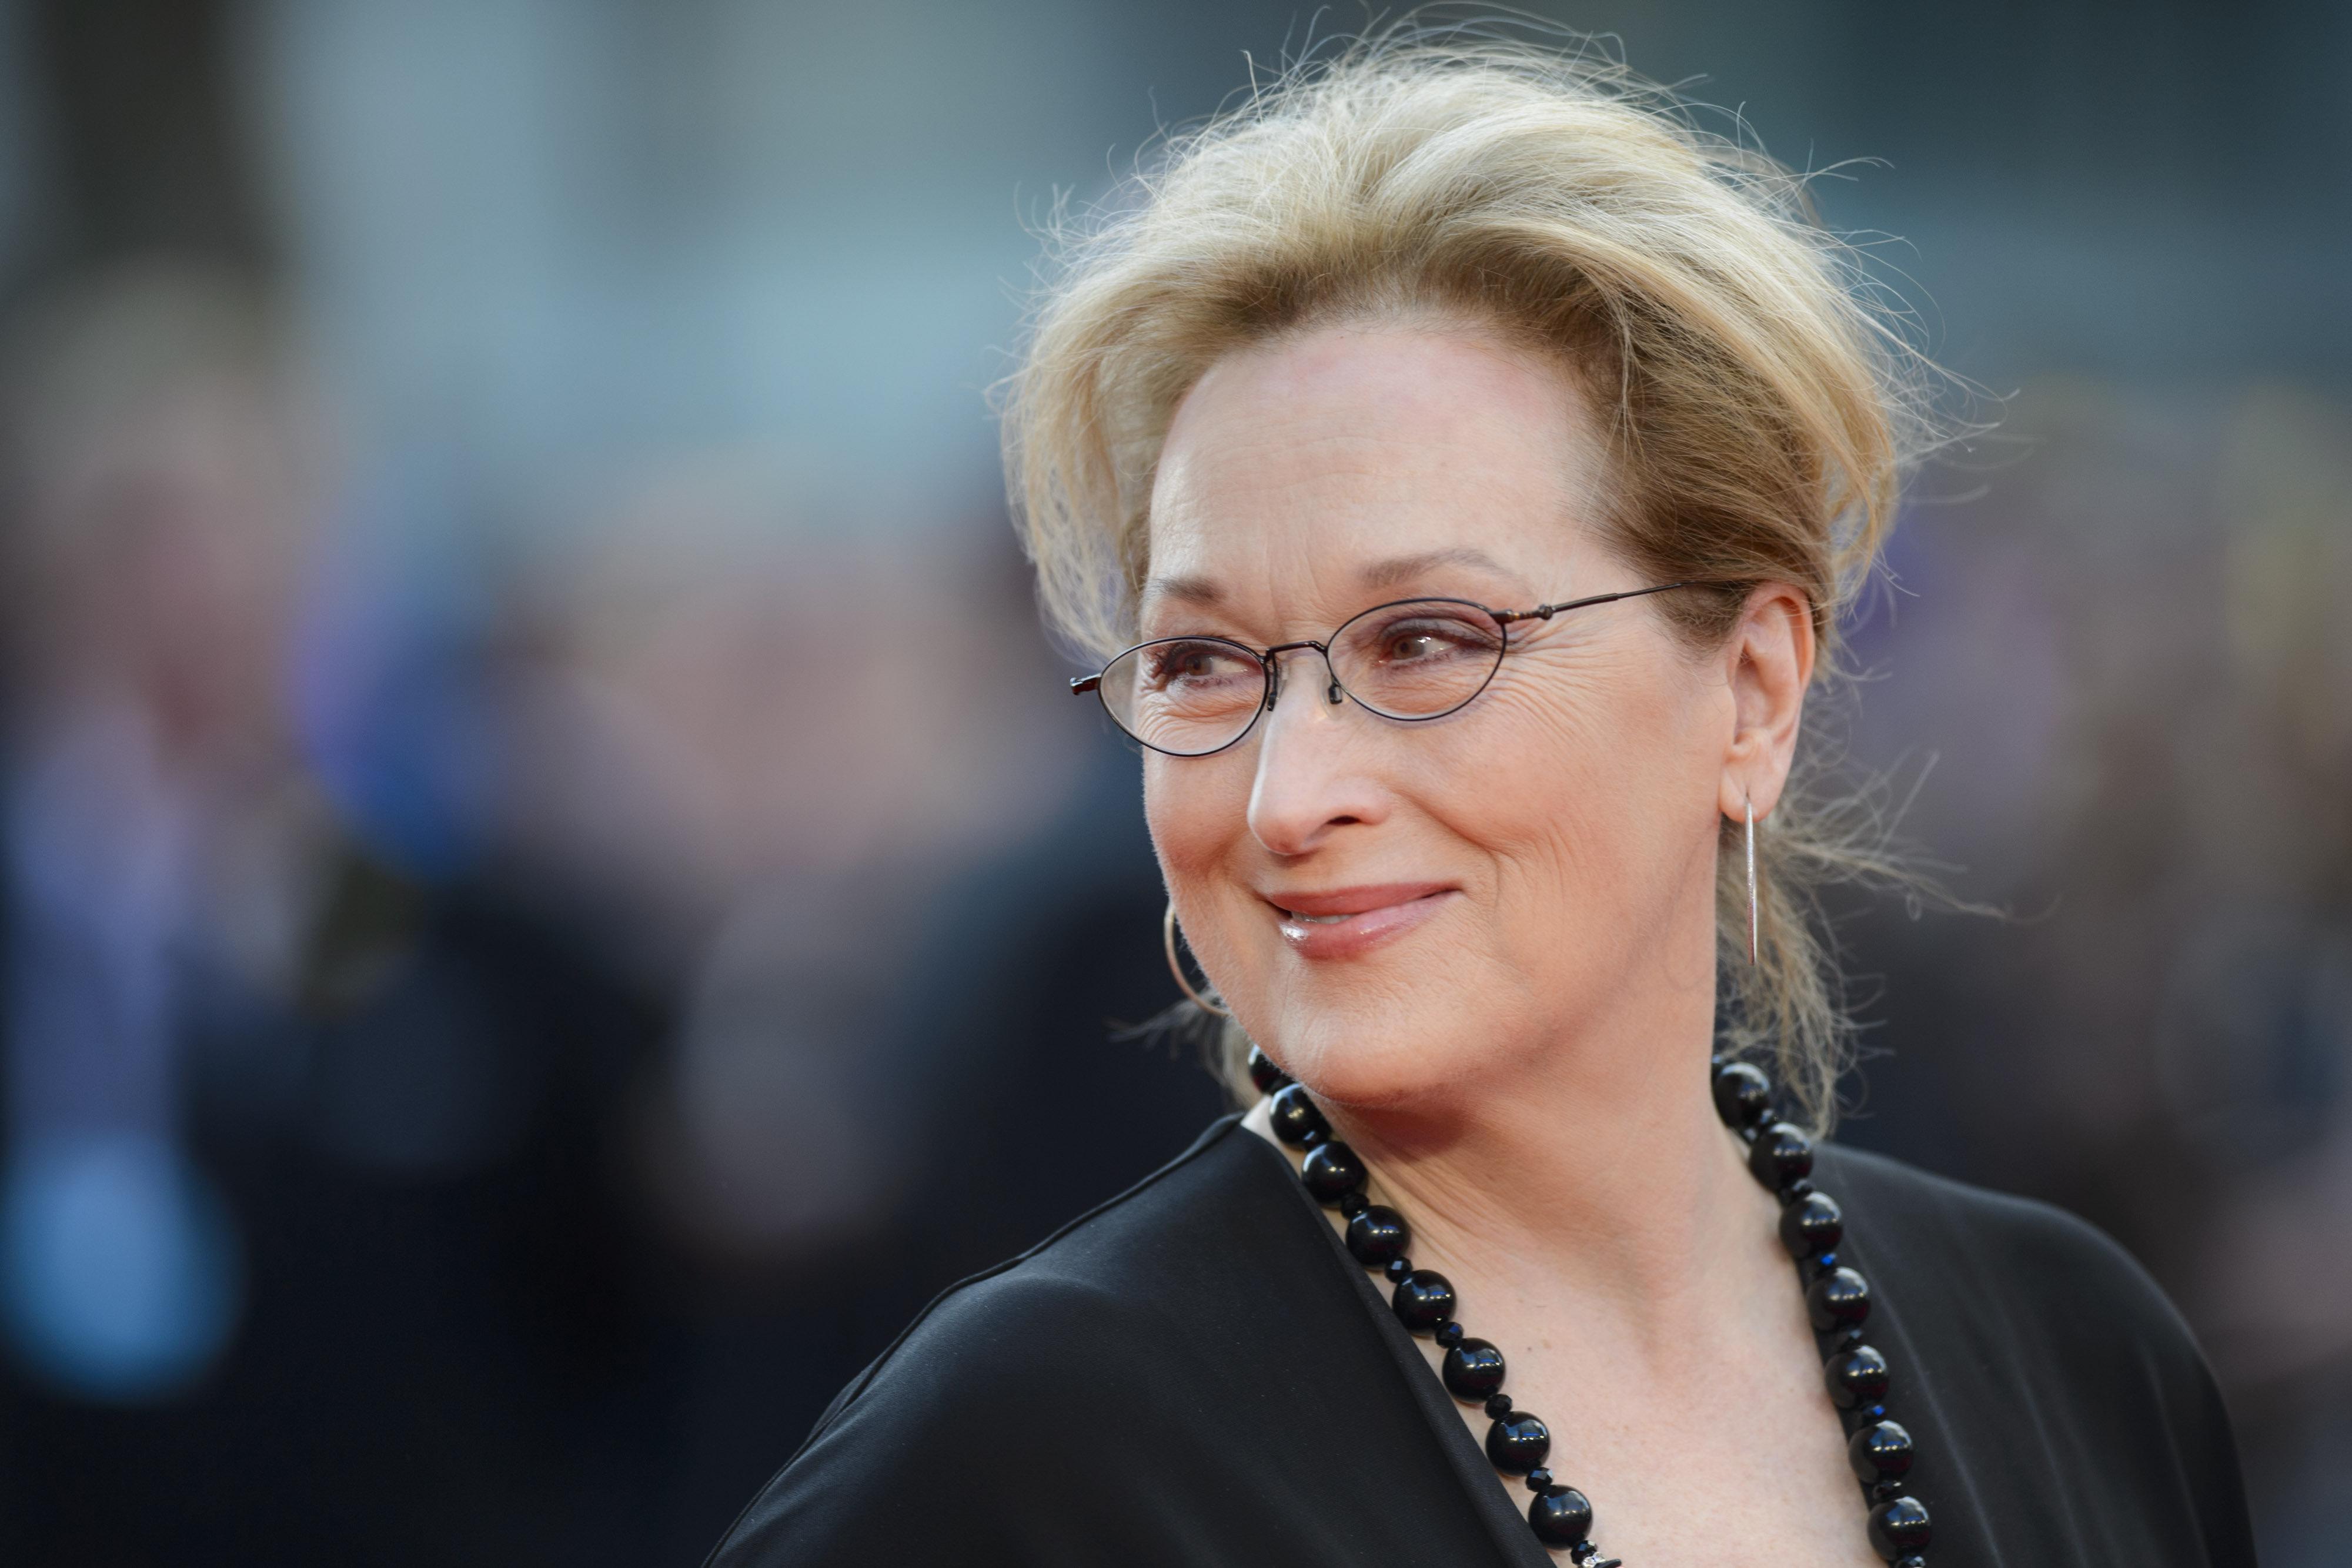 Meryl Streep: «Νομίζεις ότι ξέρεις τα πάντα για τους πάντες, αλλά δεν ξέρεις τίποτε και αυτό είναι σοκαριστικό»